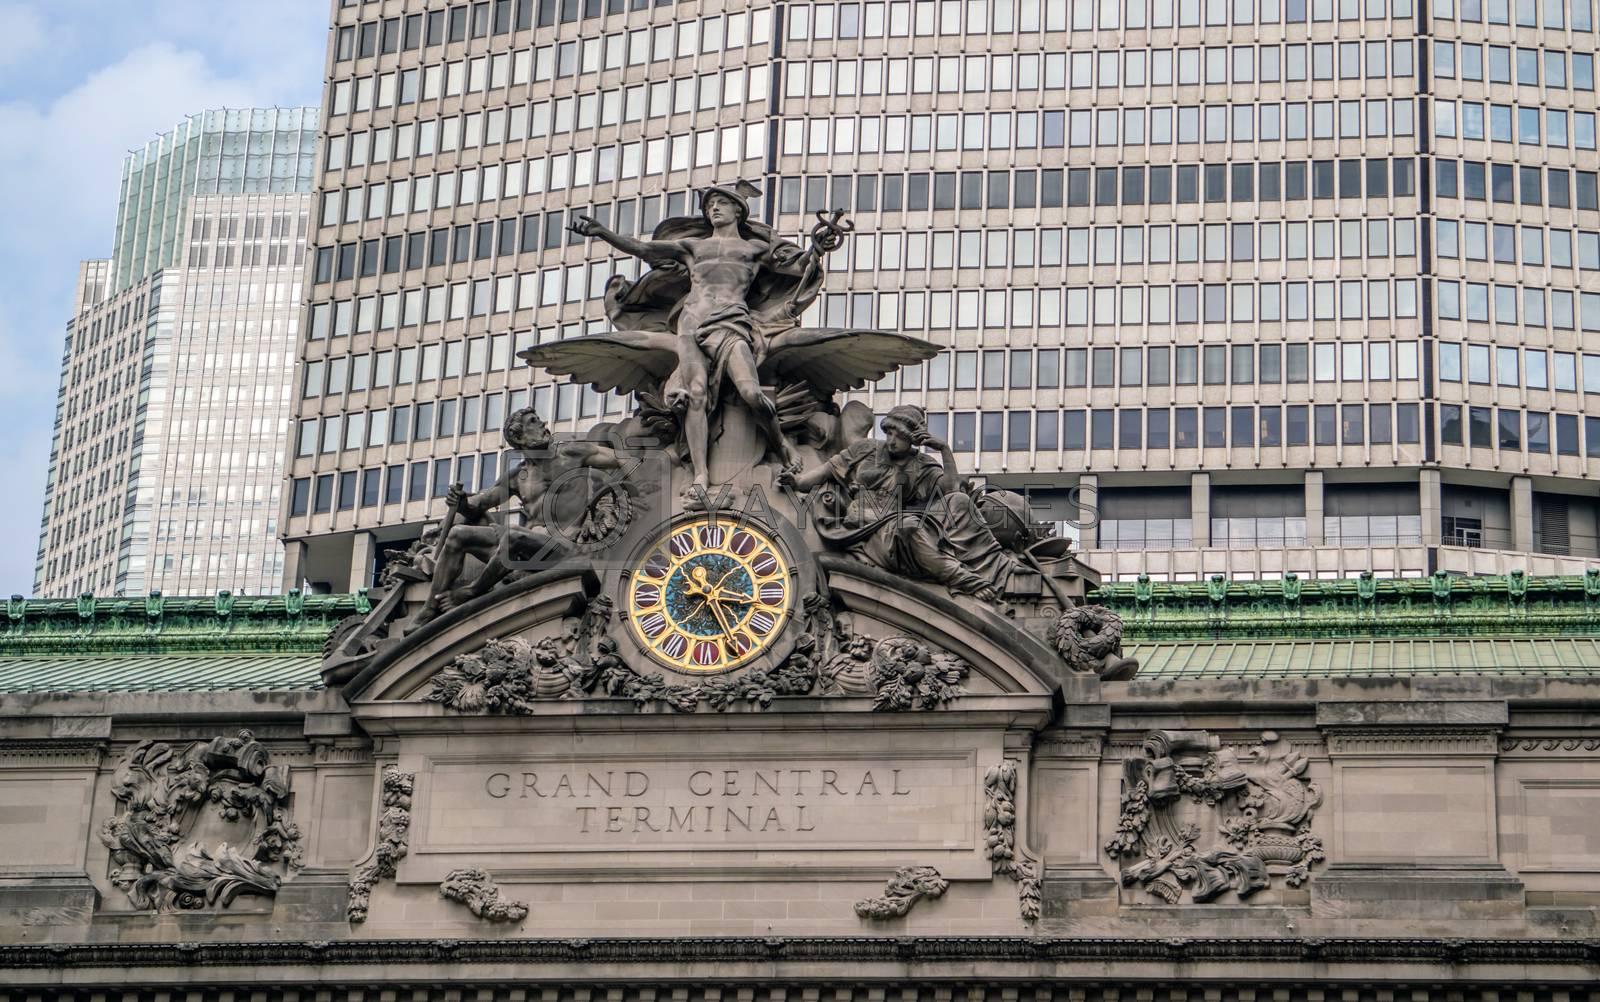 Grand Central Terminal in Manhattan New York